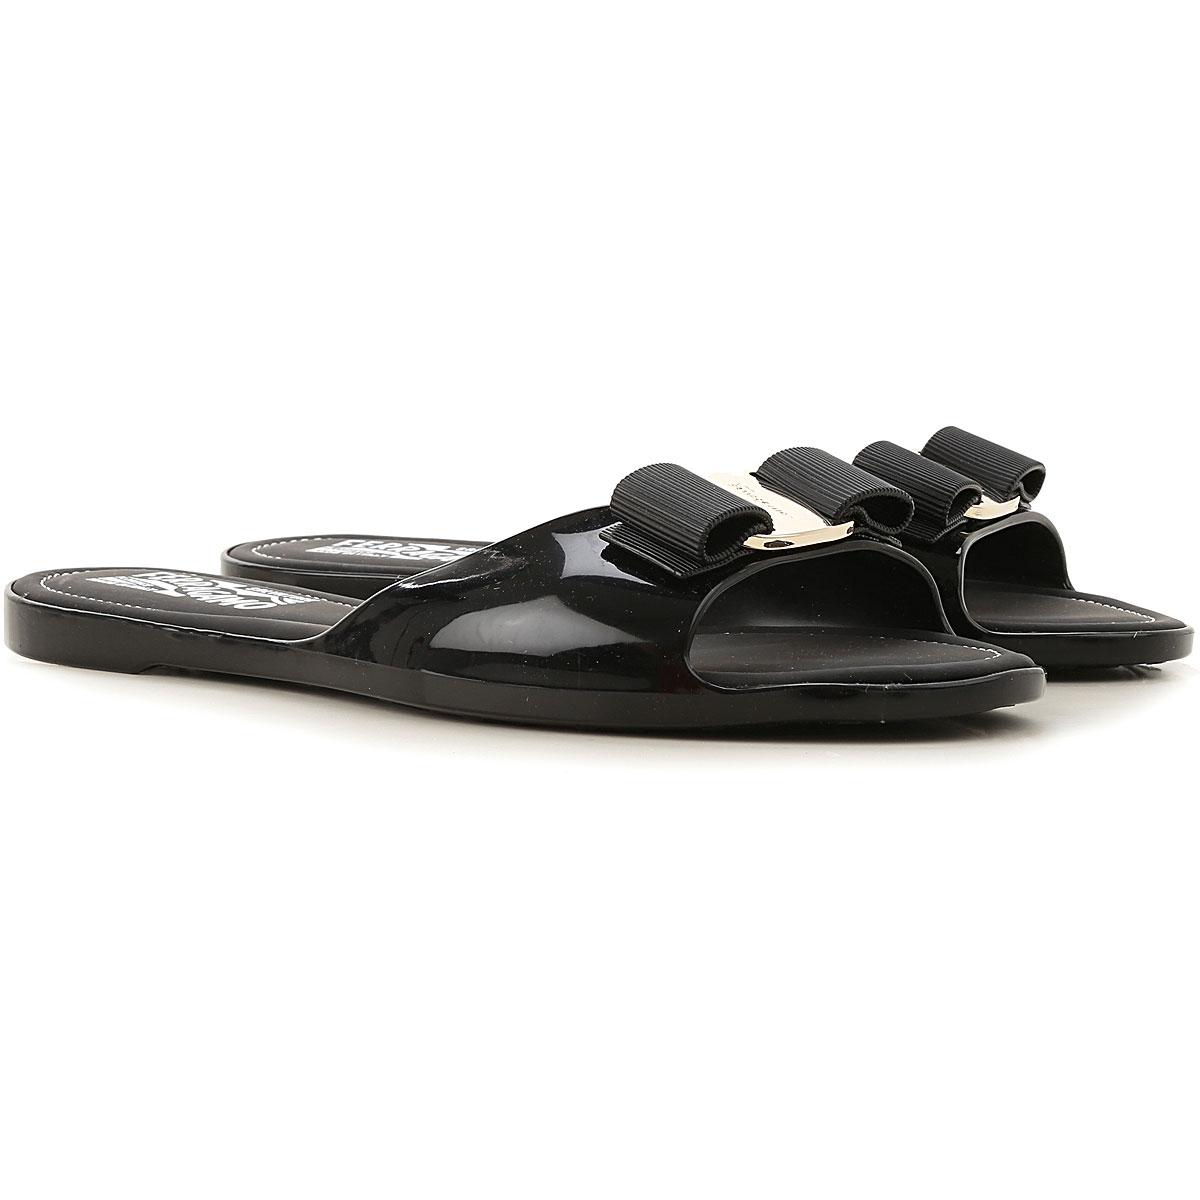 dad1a082c14 Salvatore Ferragamo. Shoes for Women